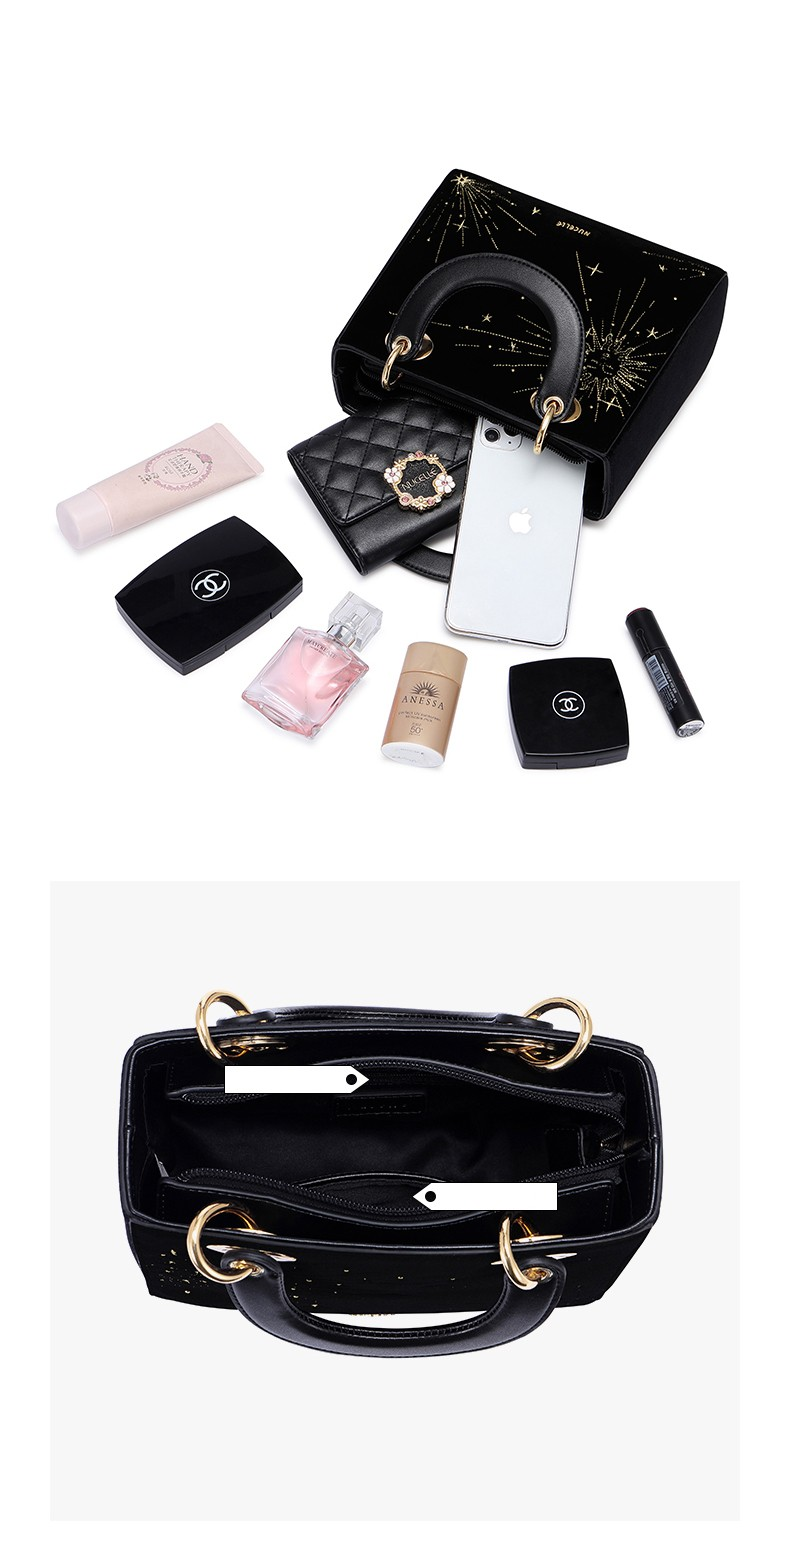 Túi xách nữ thời trang Nucelle Virgo VG598